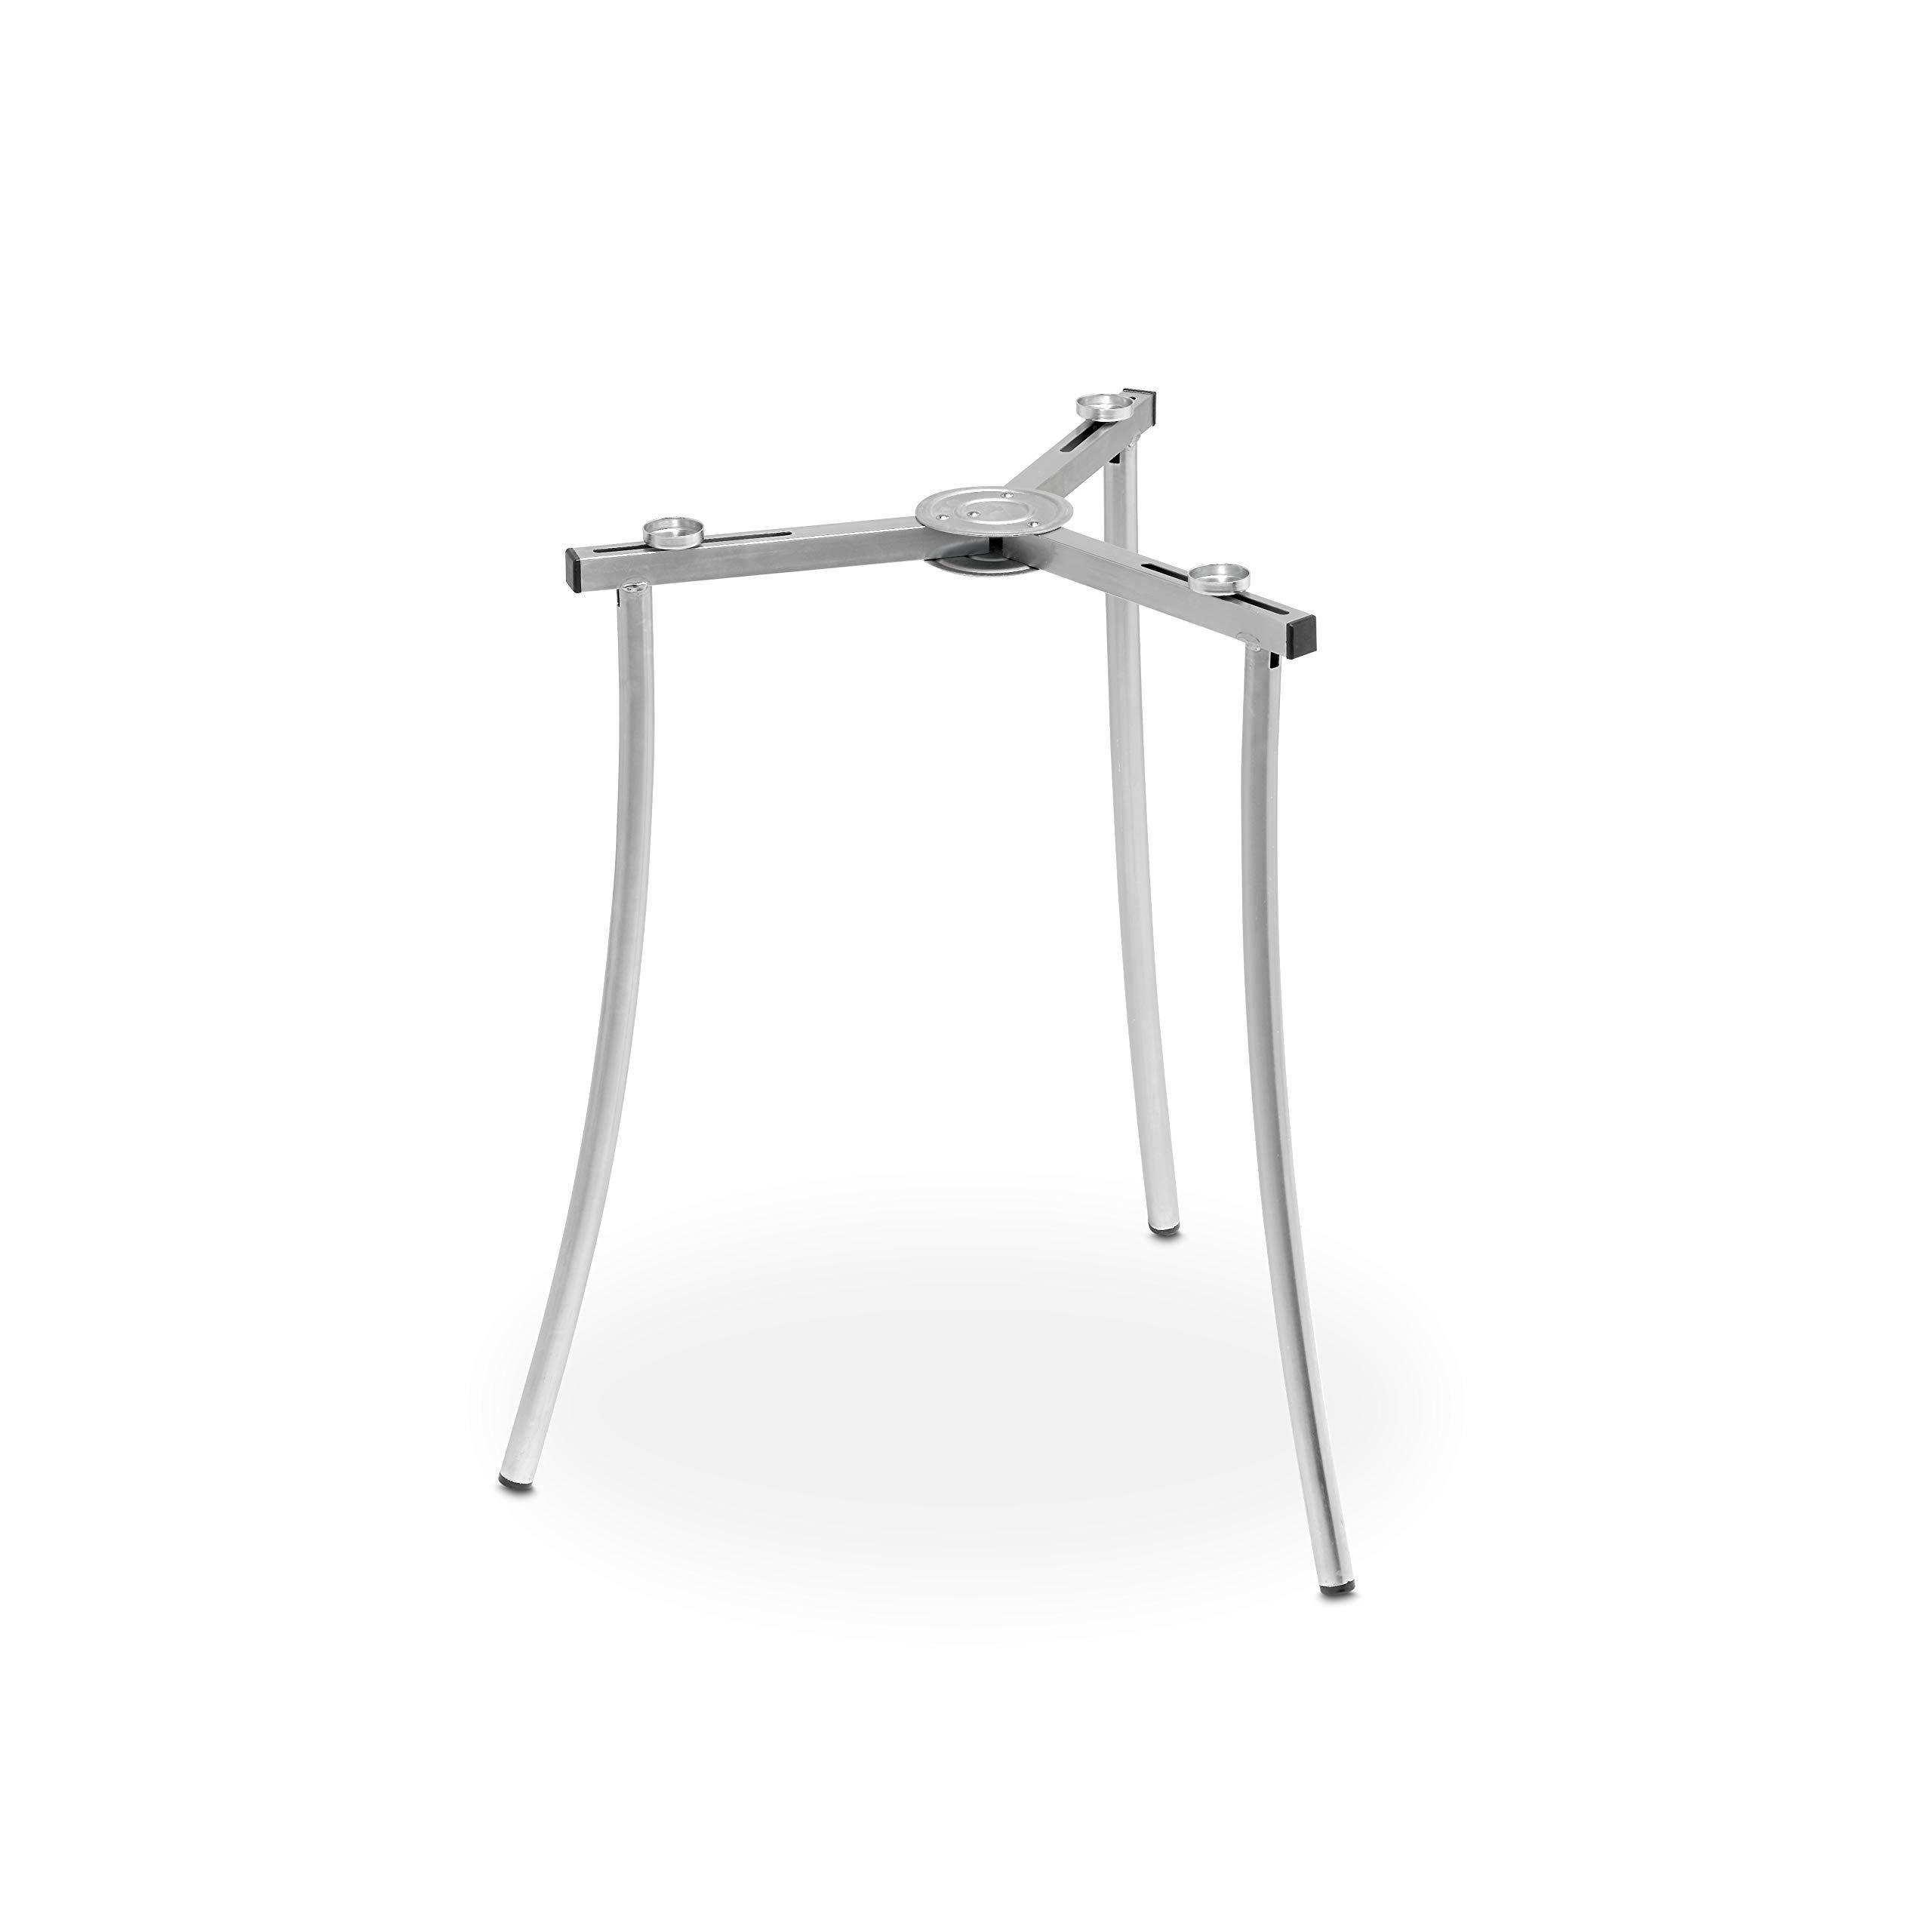 Castevia Imports Adjustable Tripod/Reinforced Legs